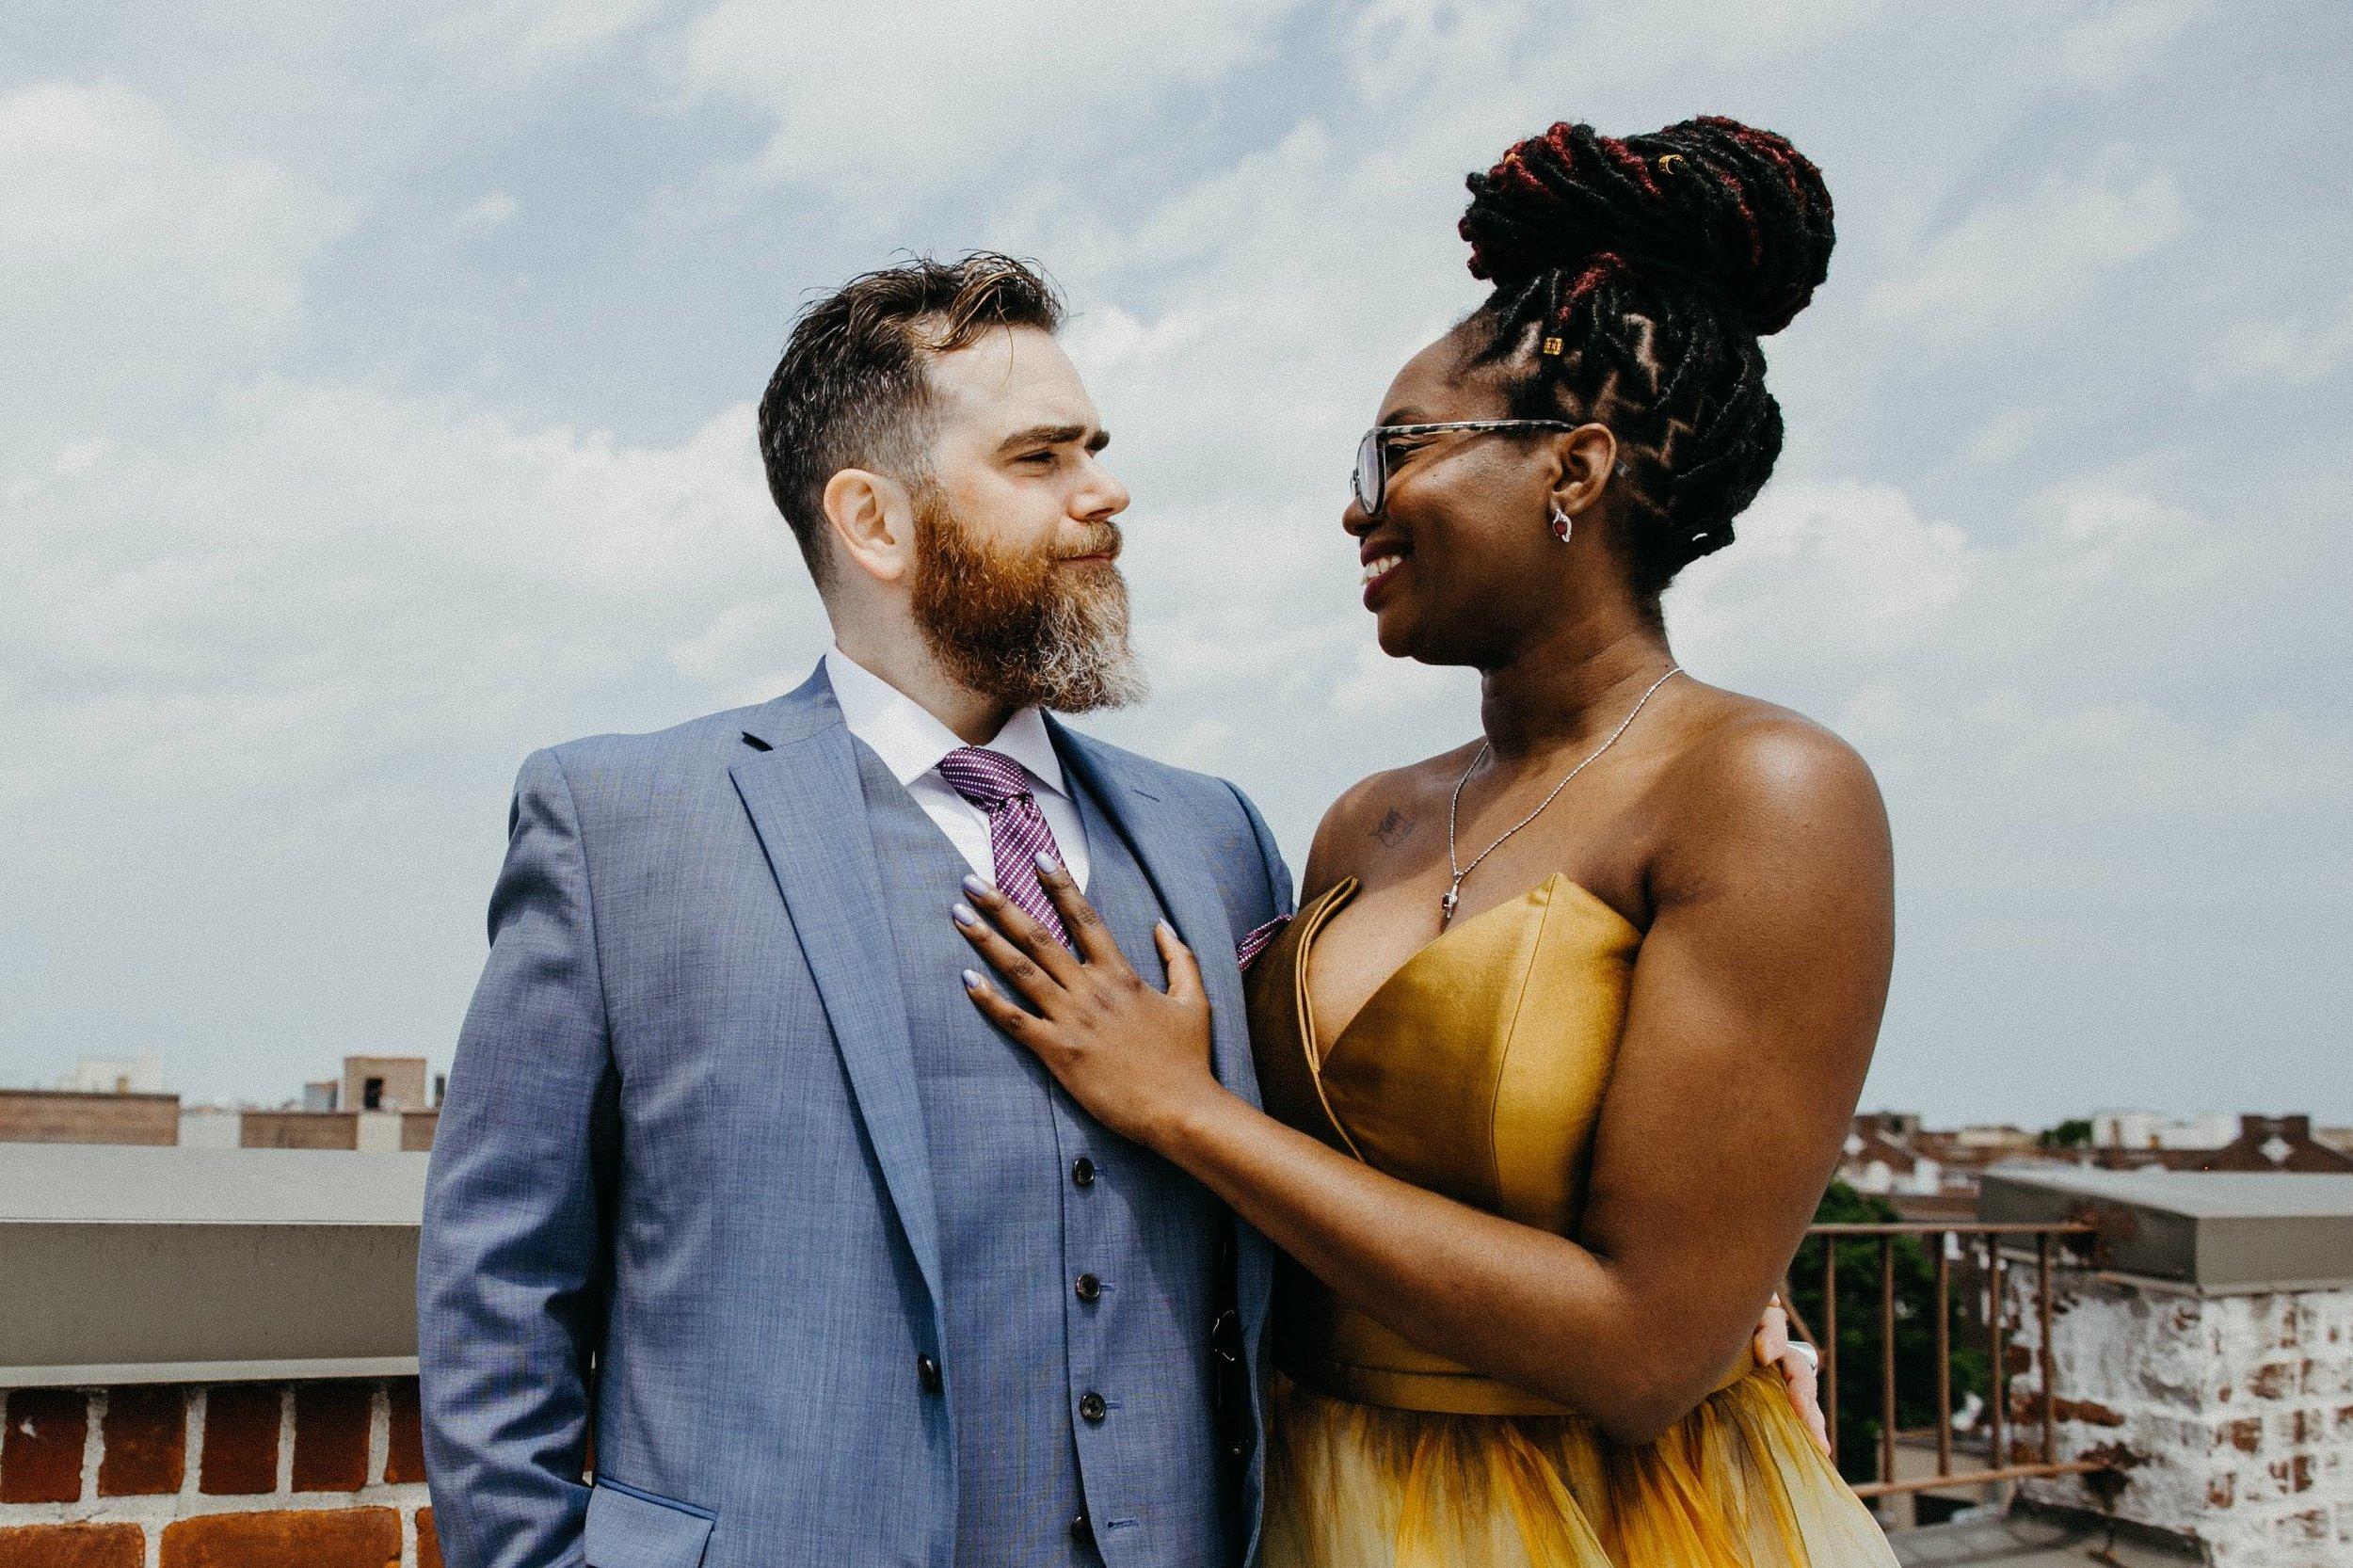 Sevlynn-Photography-Wedding-LIC-Landing-Maiella-NYC-4.jpg